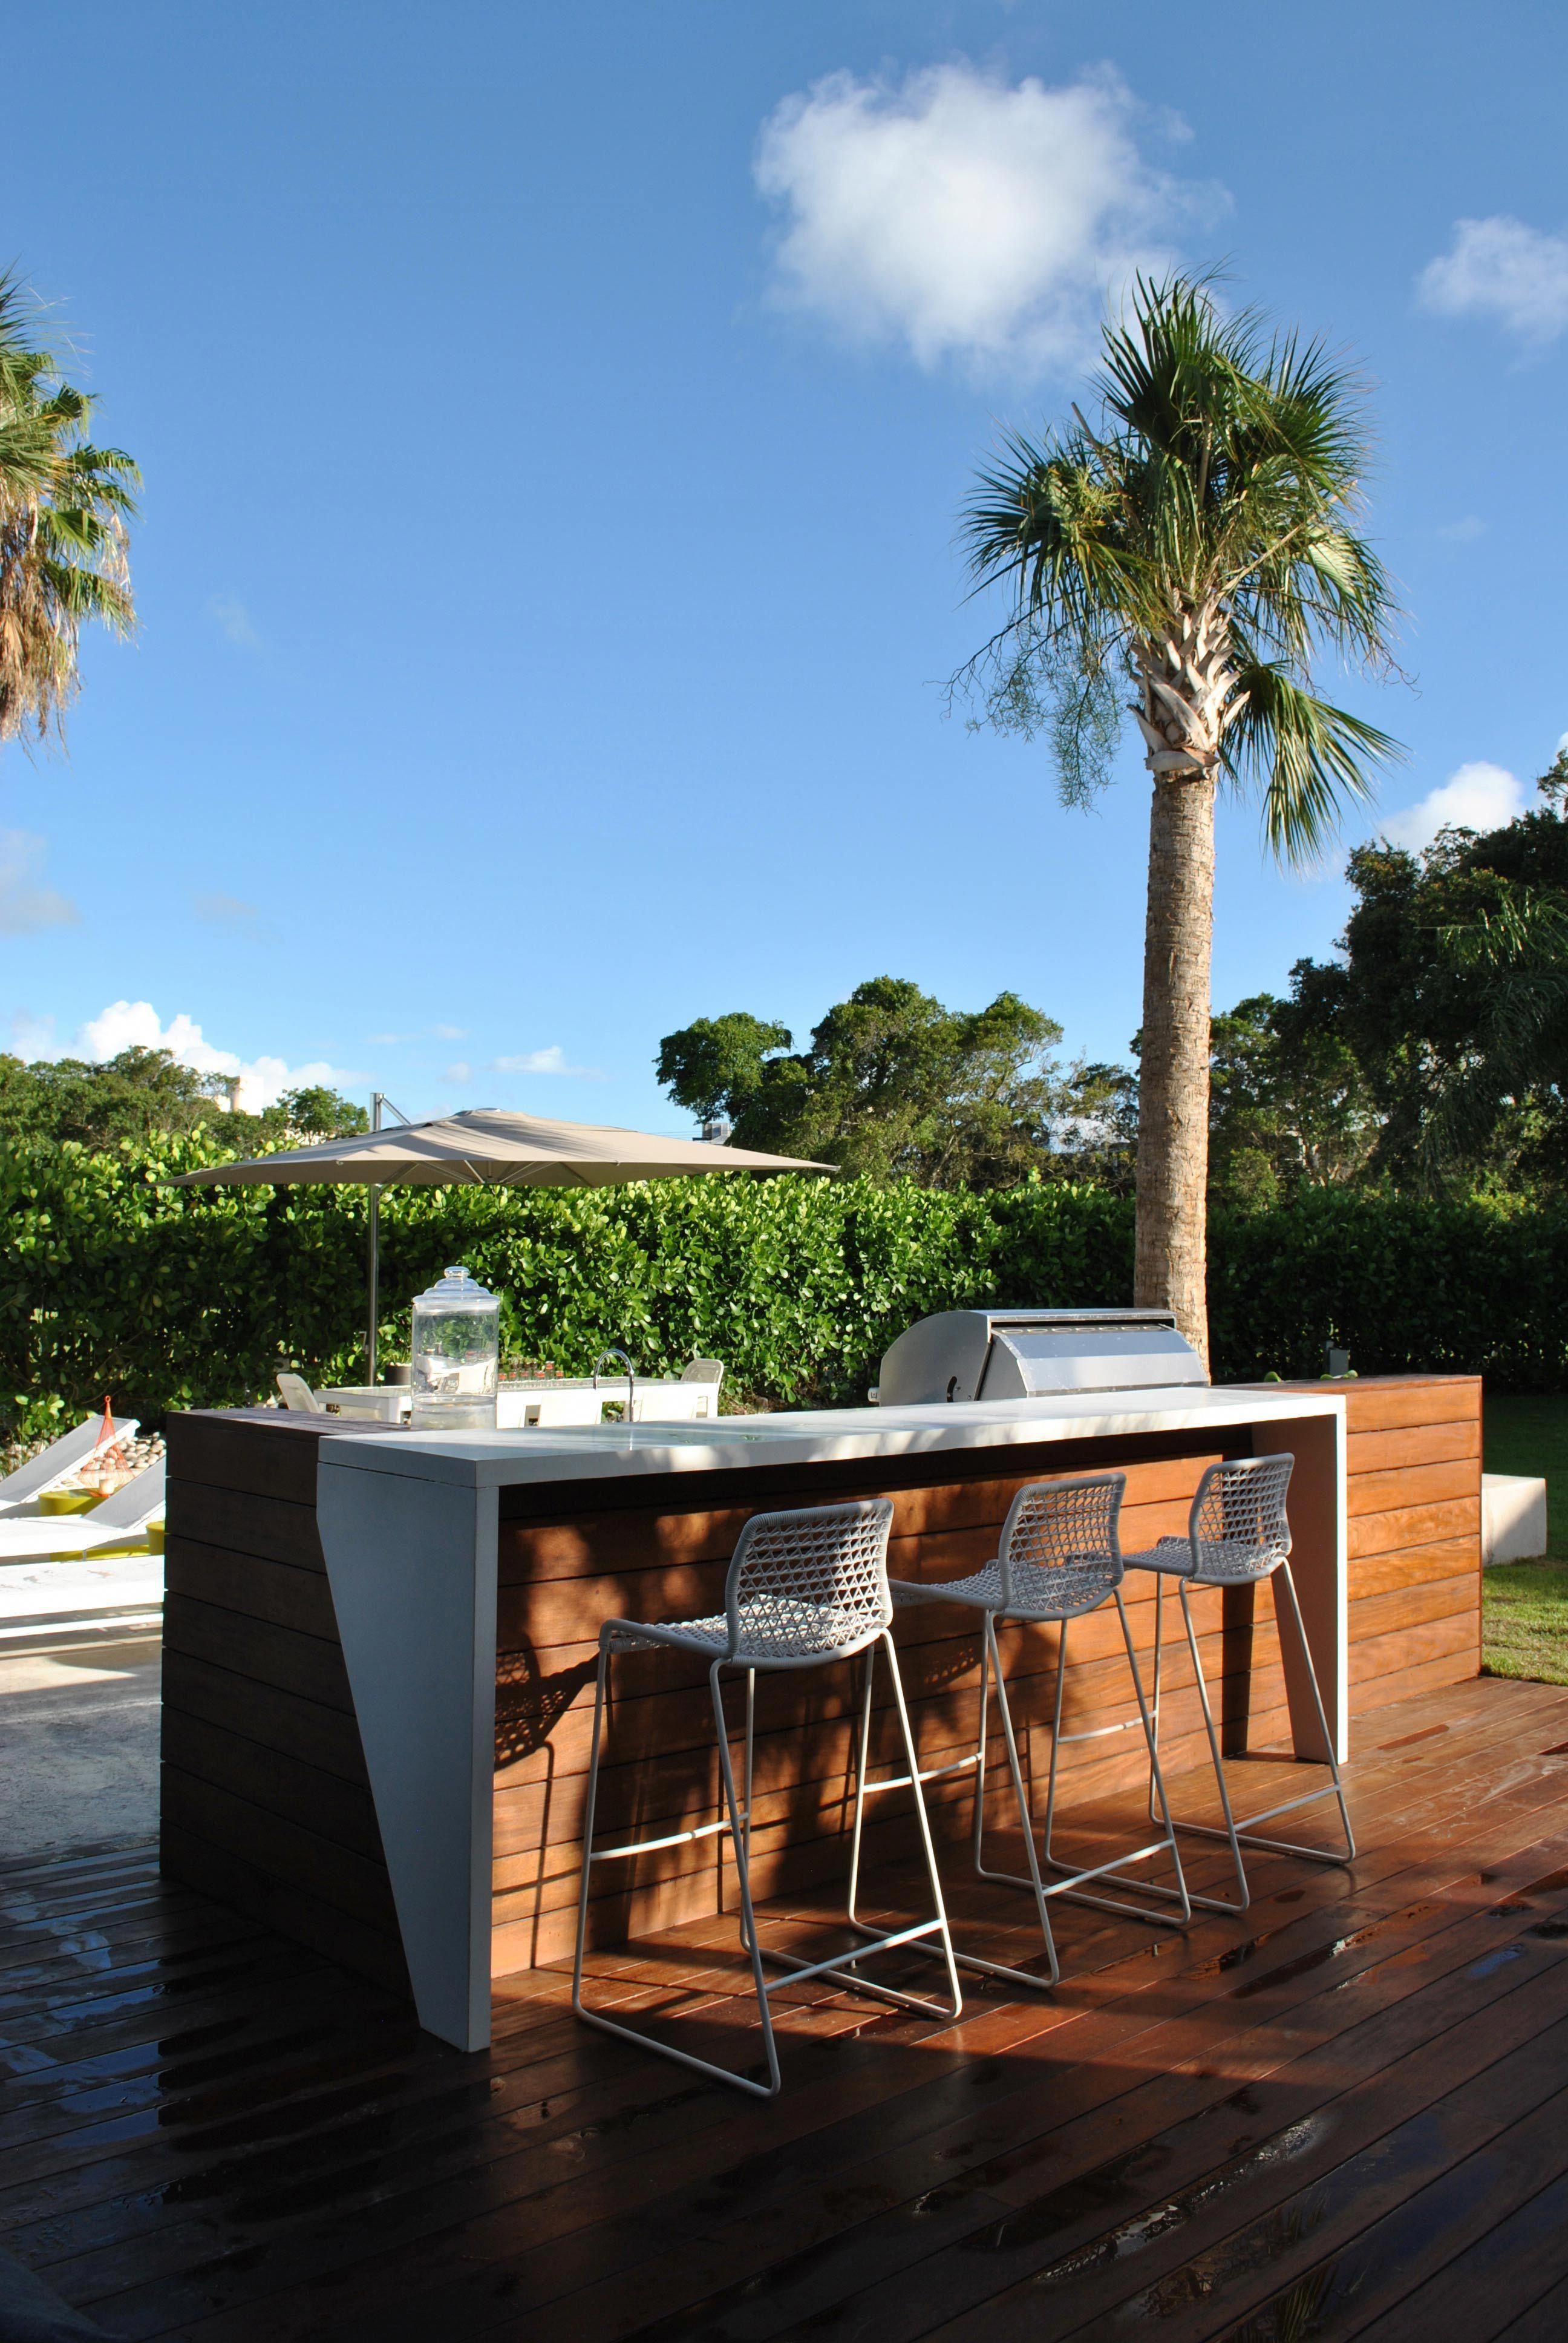 Best Diy Outdoor Bar Ideas And Design Modernbar Outdoorbar Outdoorkitchendesignslayoutpatio Modern Outdoor Kitchen Outdoor Kitchen Design Outdoor Kitchen Modern backyard bar ideas